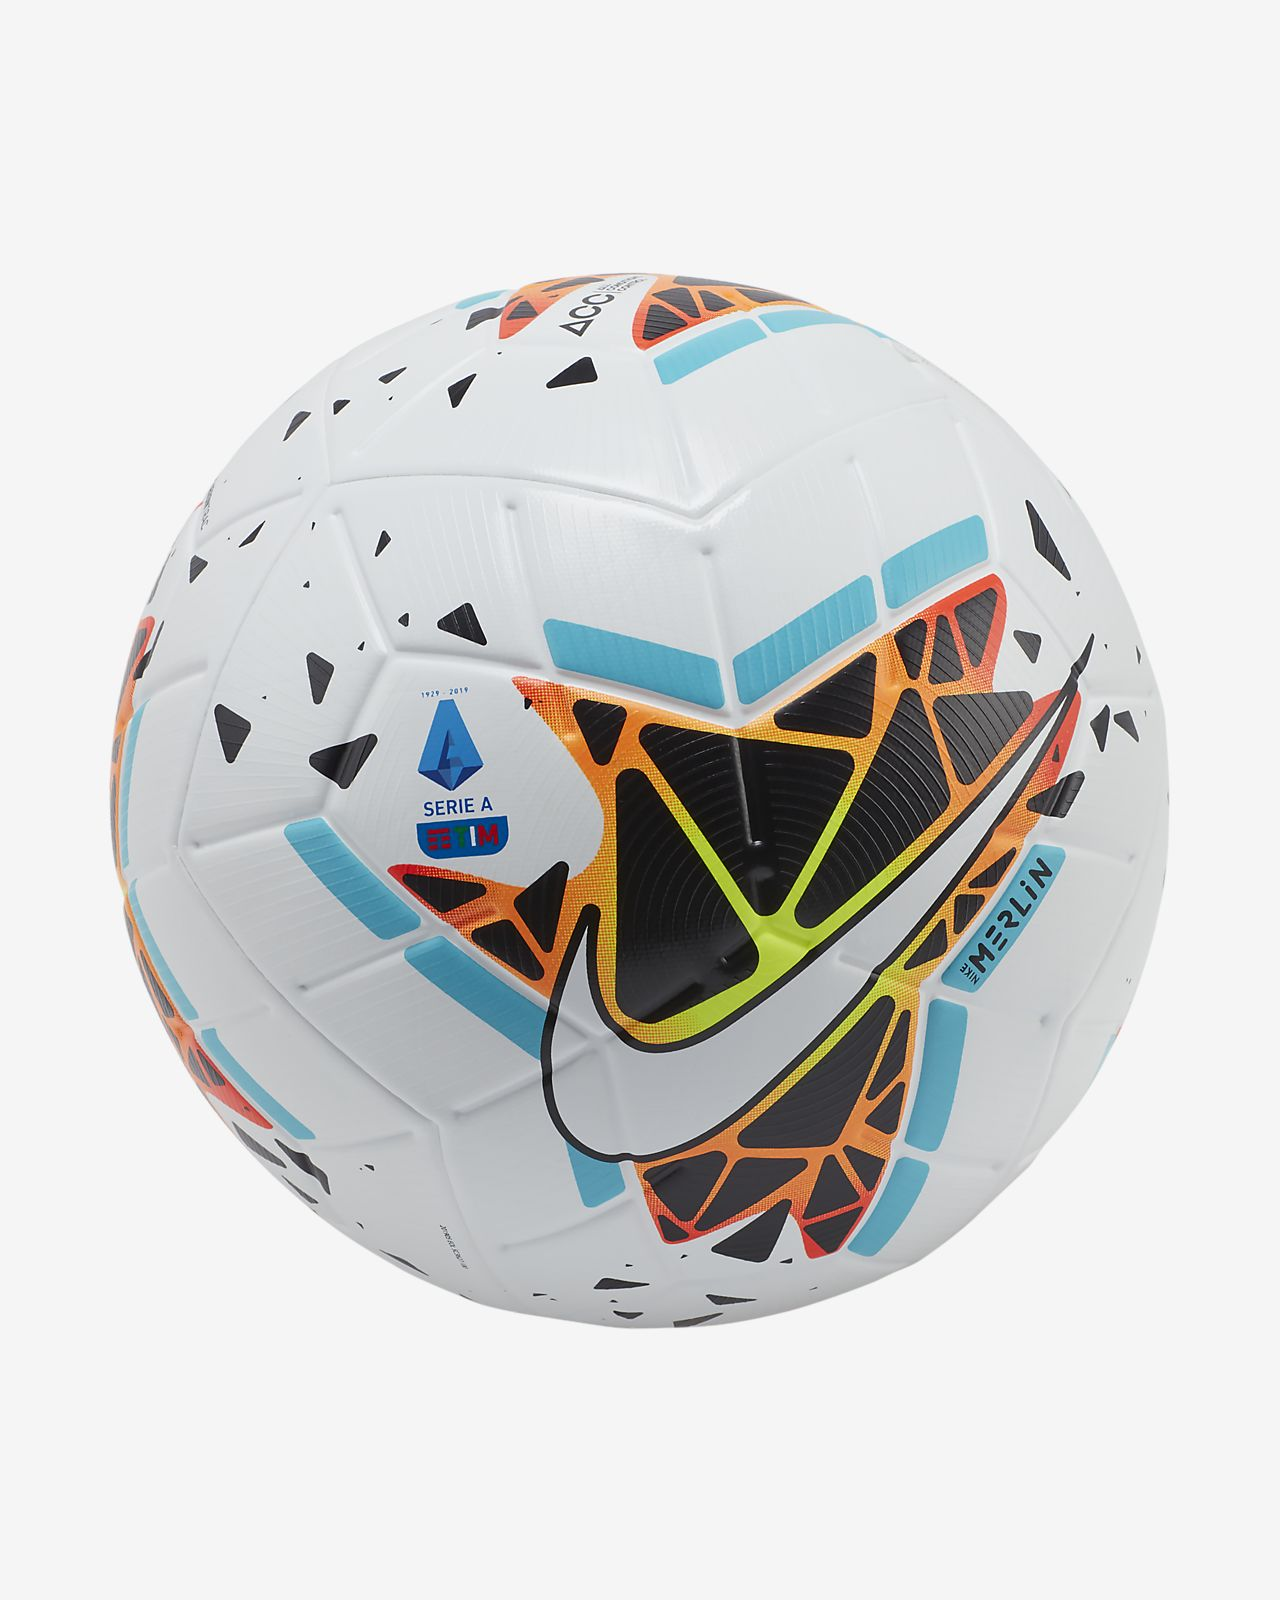 Serie A Merlin fotball